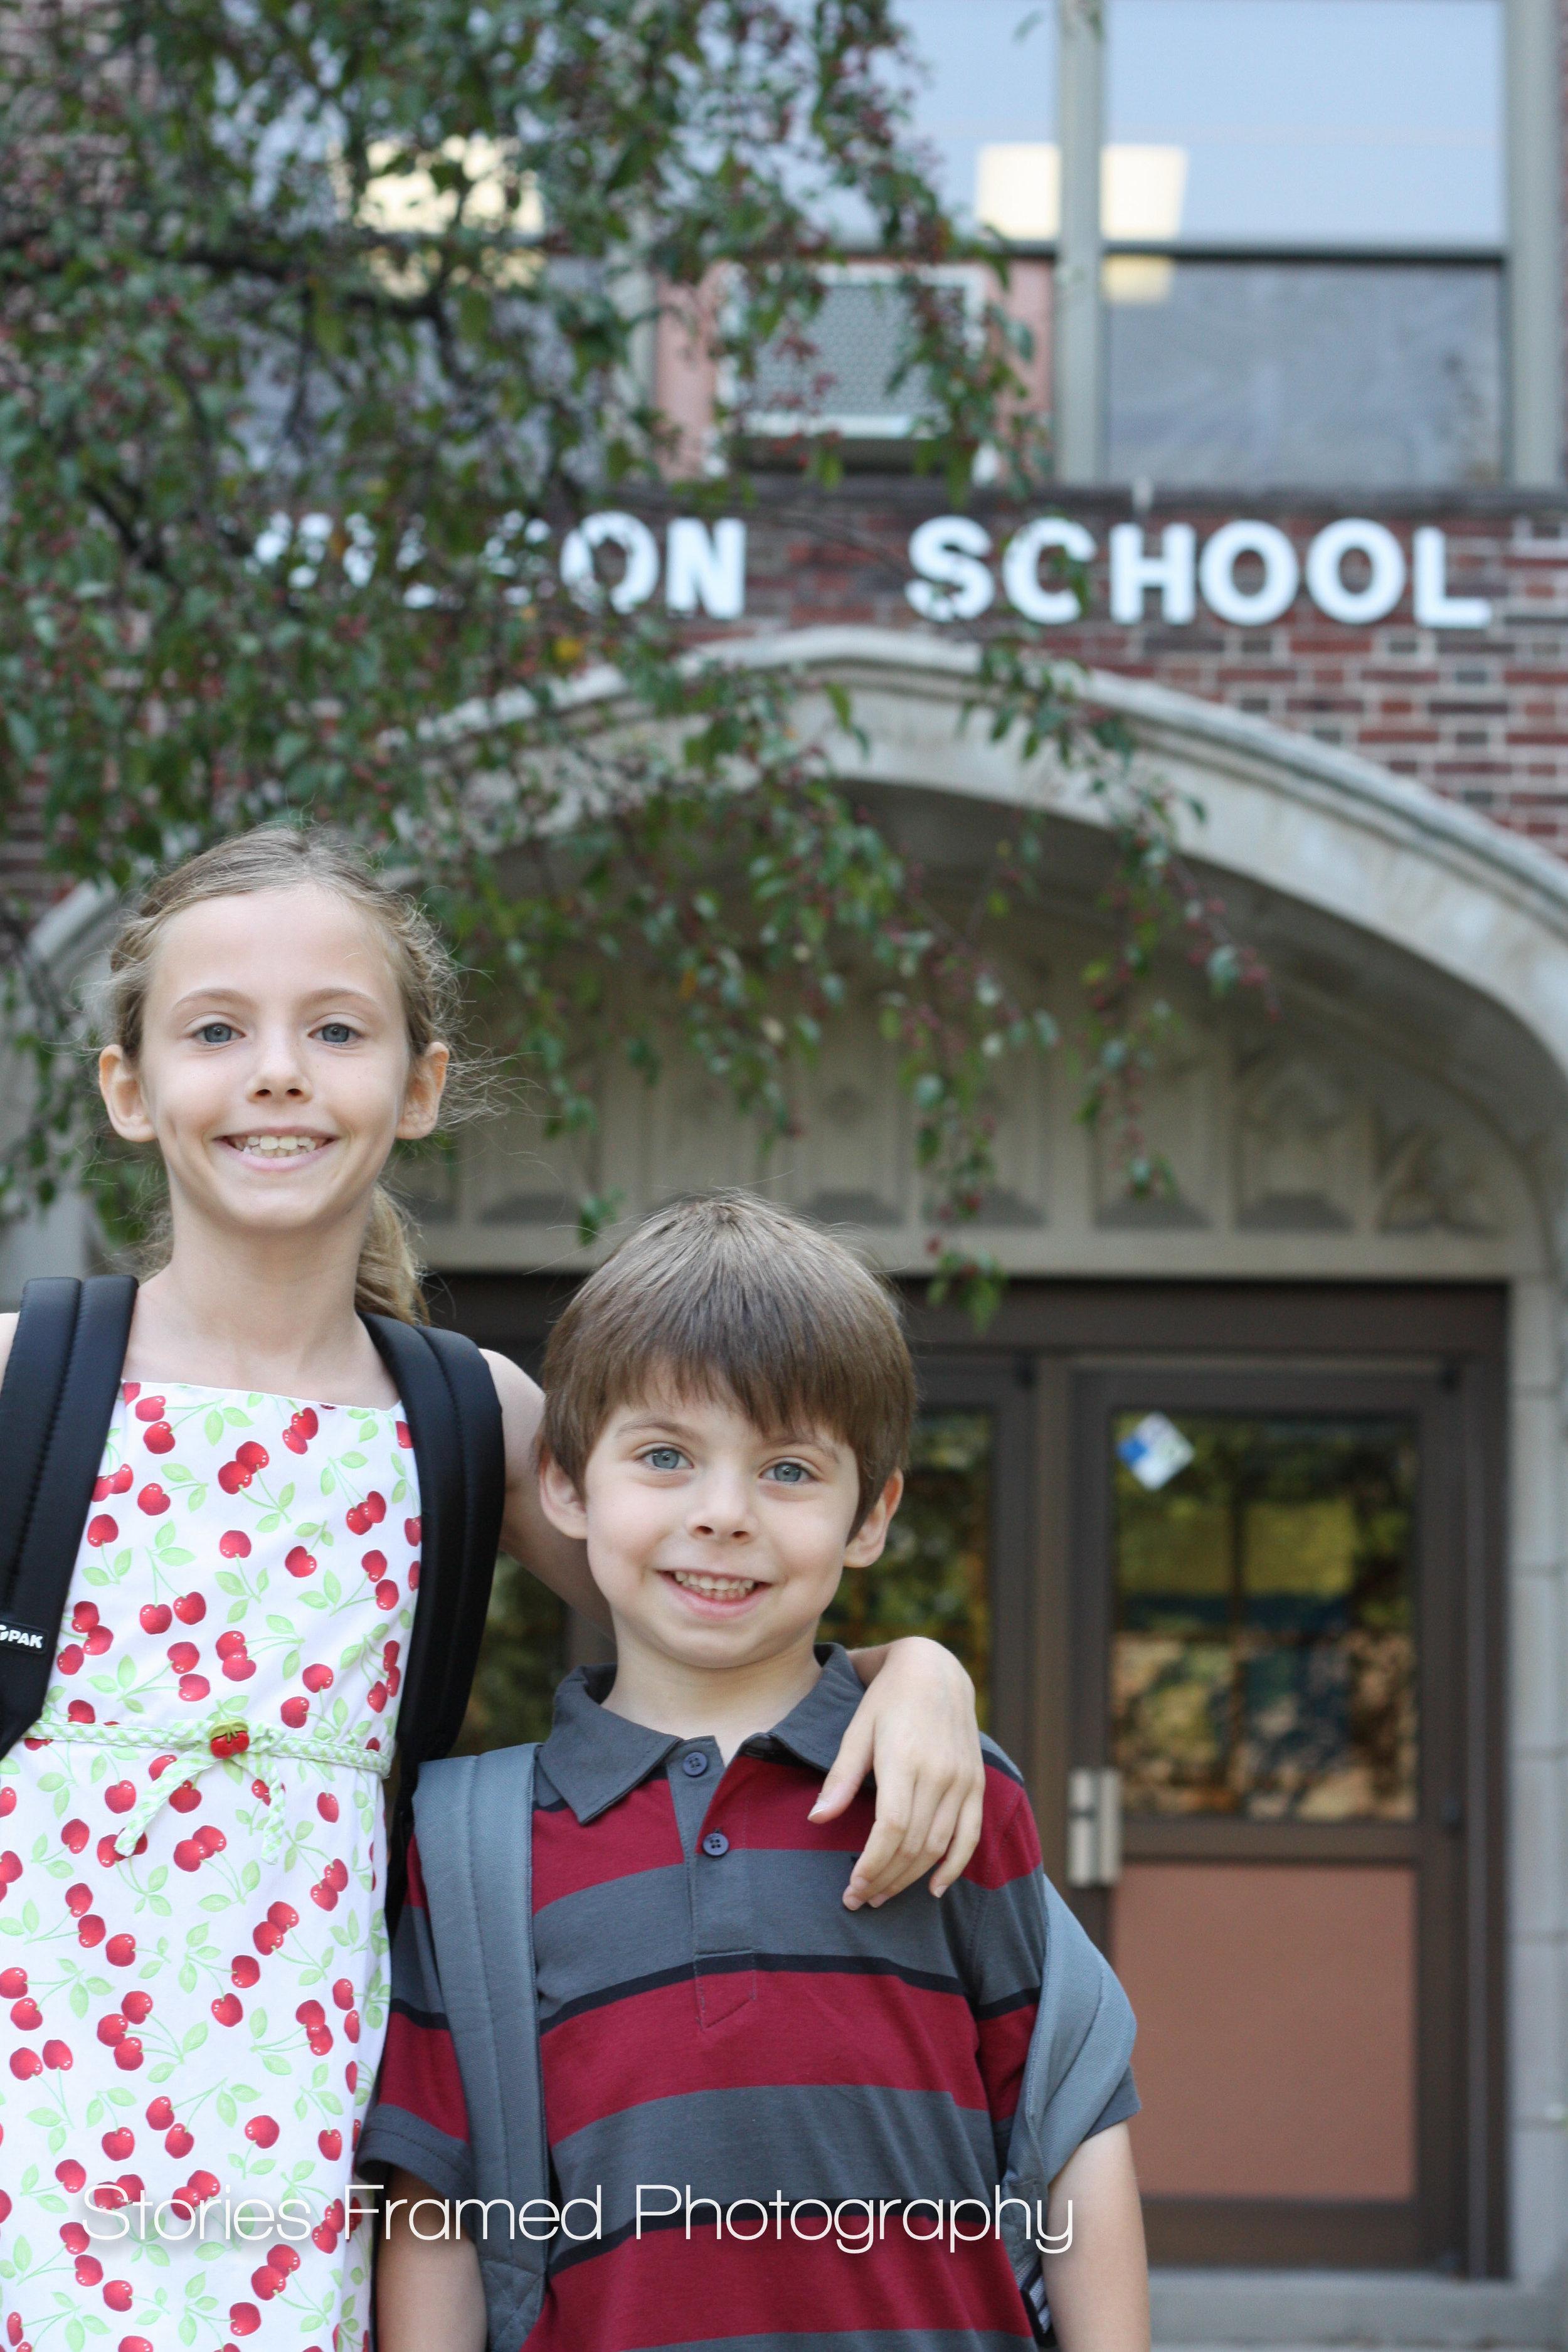 2011 | 3rd grade and 5K at a new school